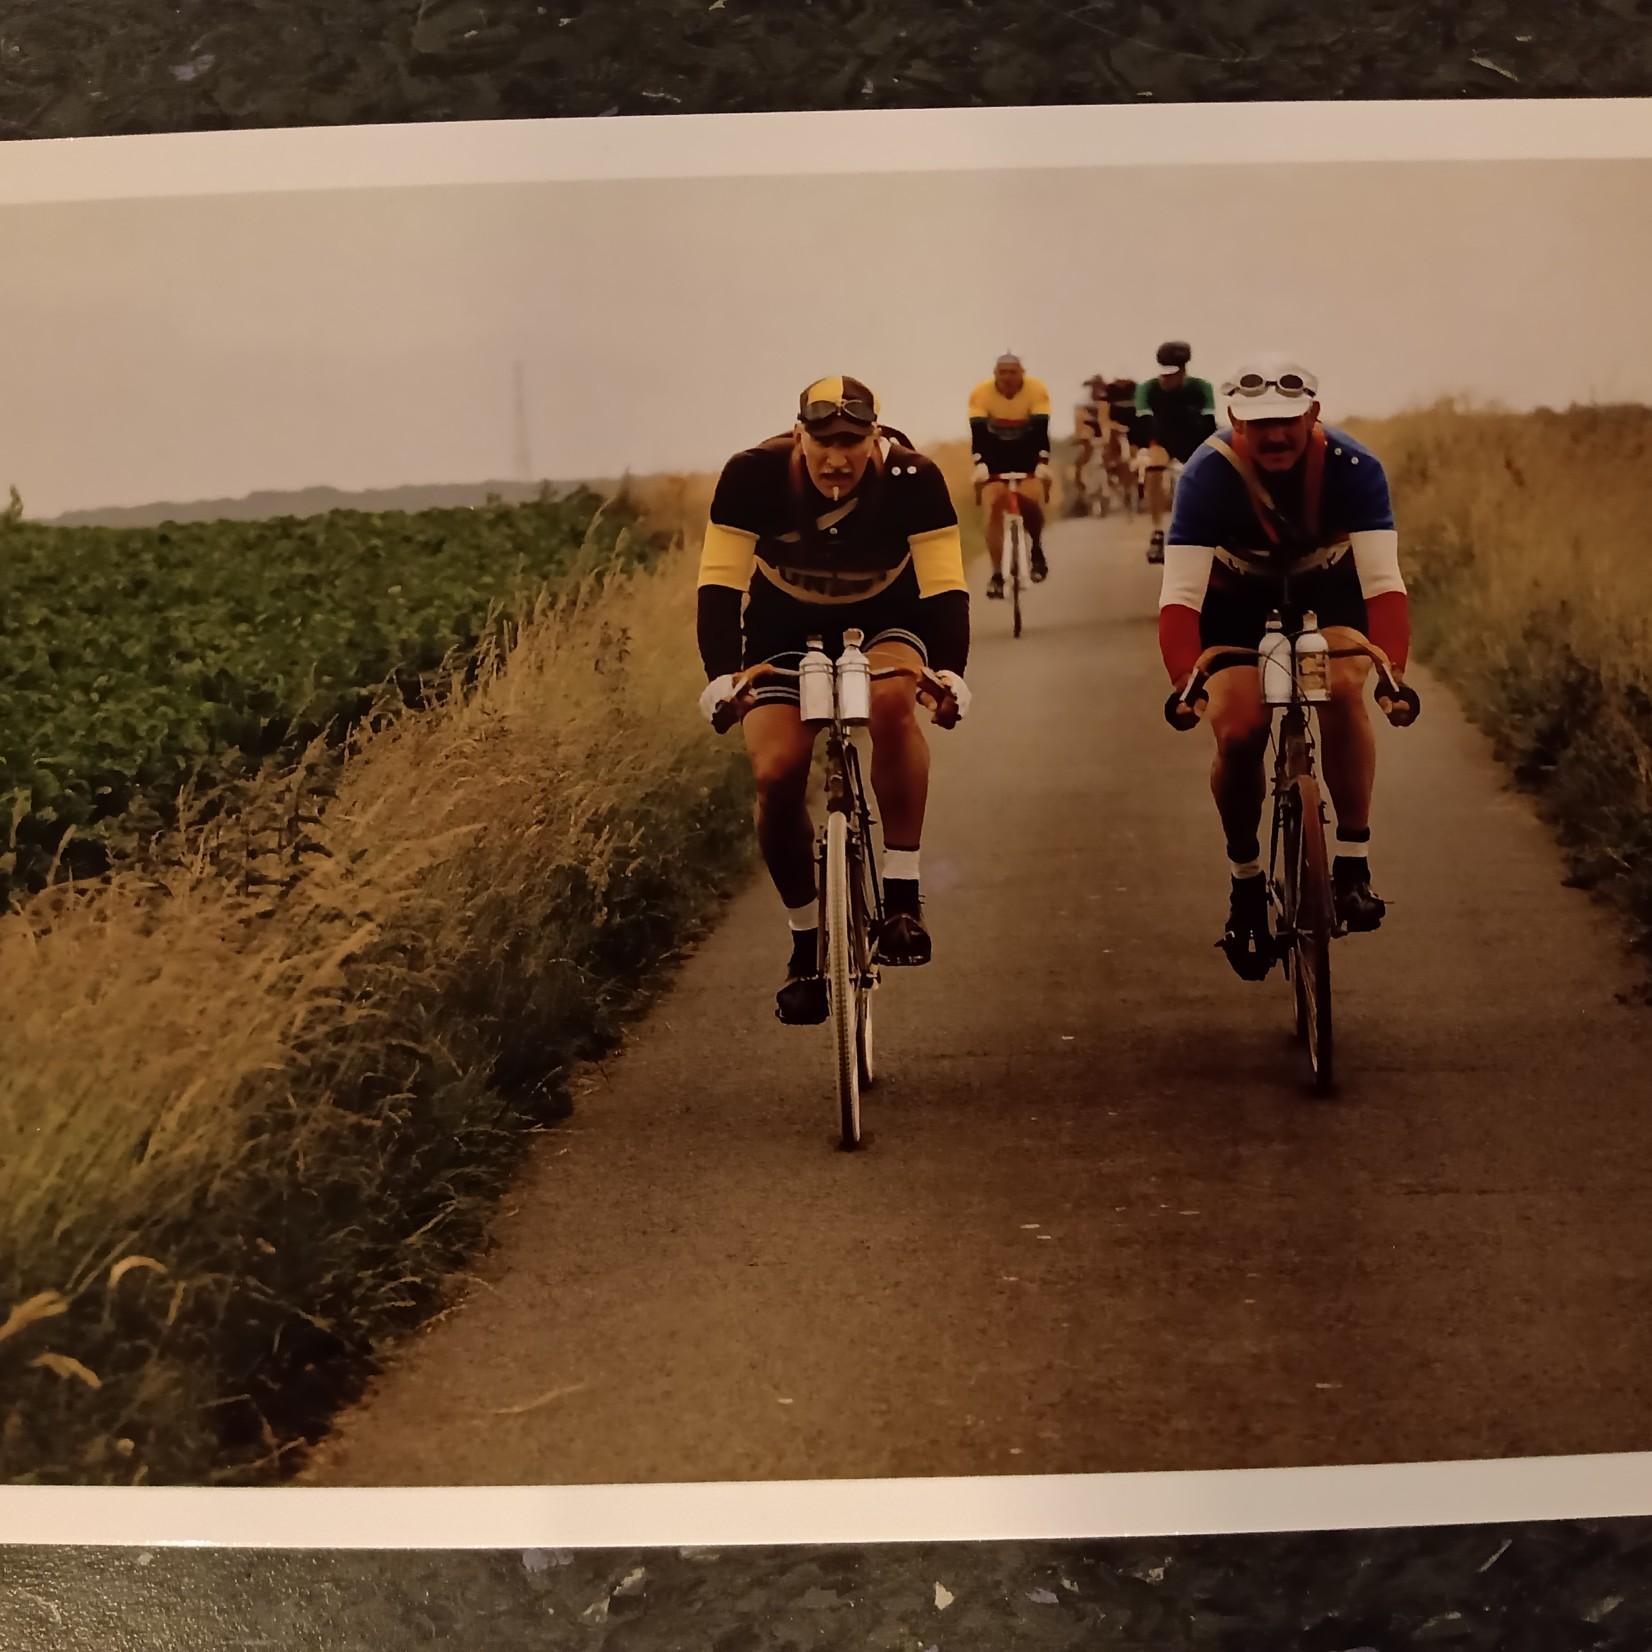 Postcard 'Retro tour (2 cyclists)'